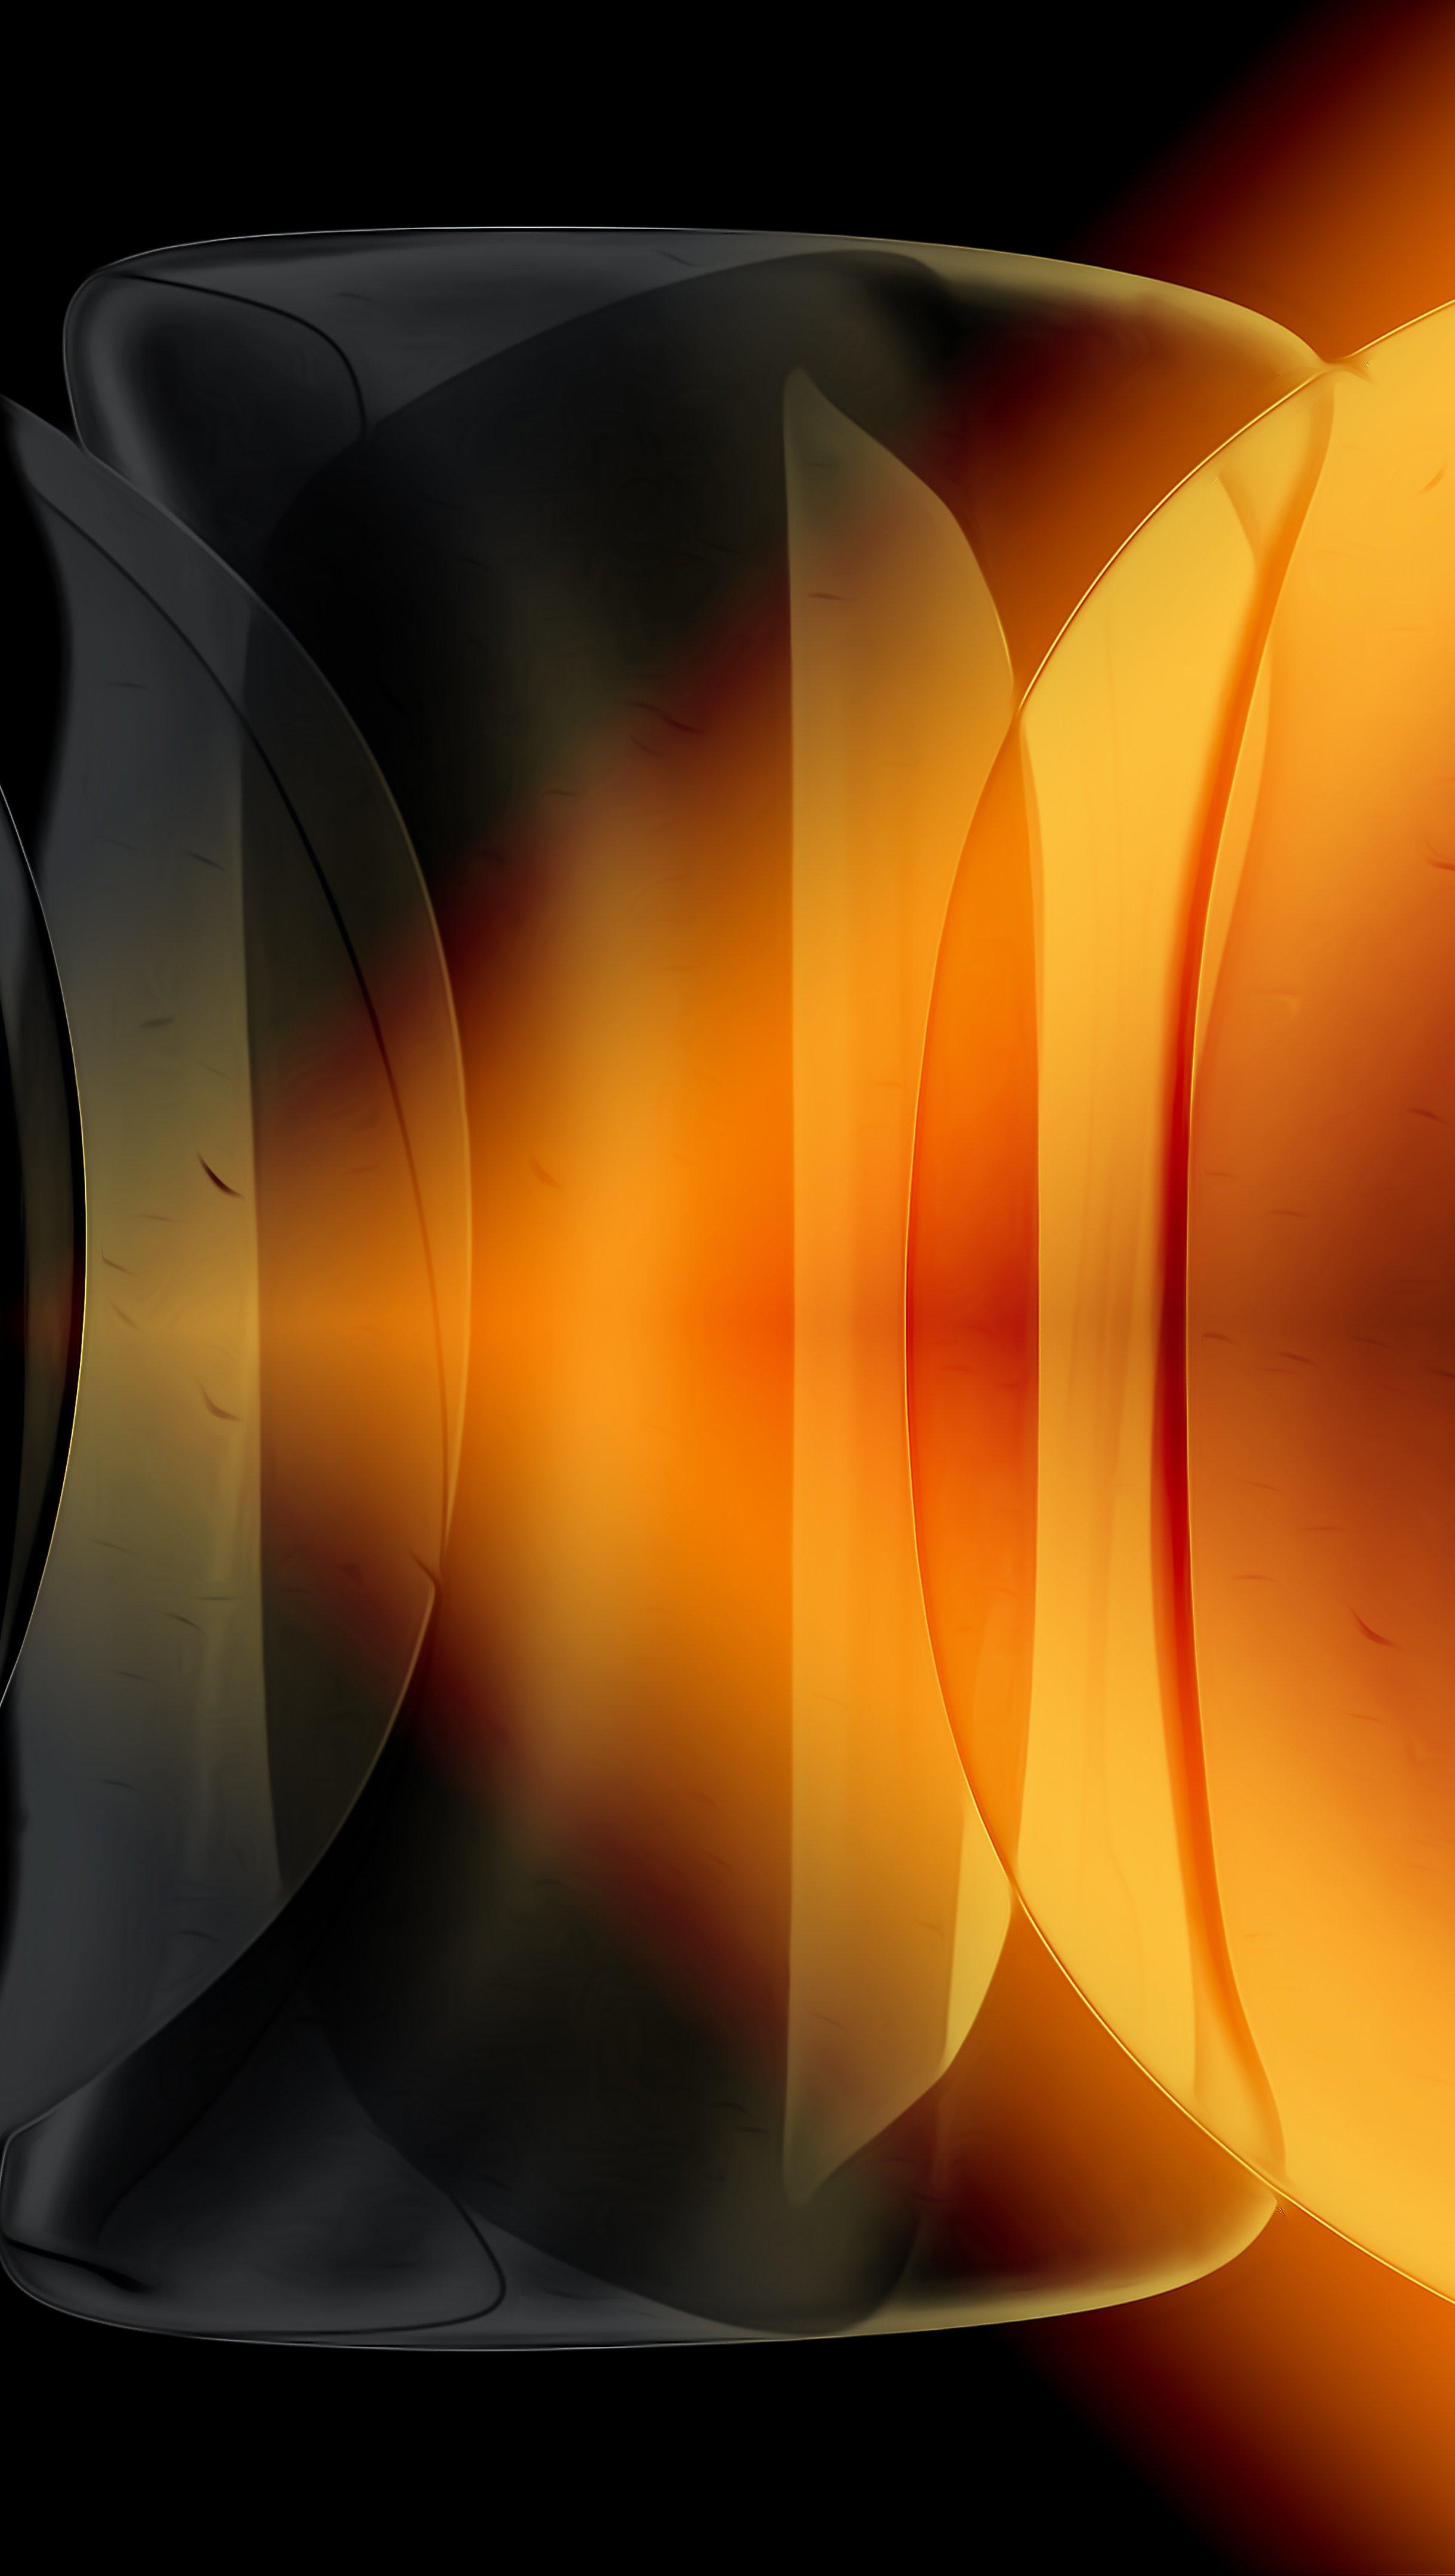 Fondos de pantalla Burbujas en diferentes figuras geometricas Vertical